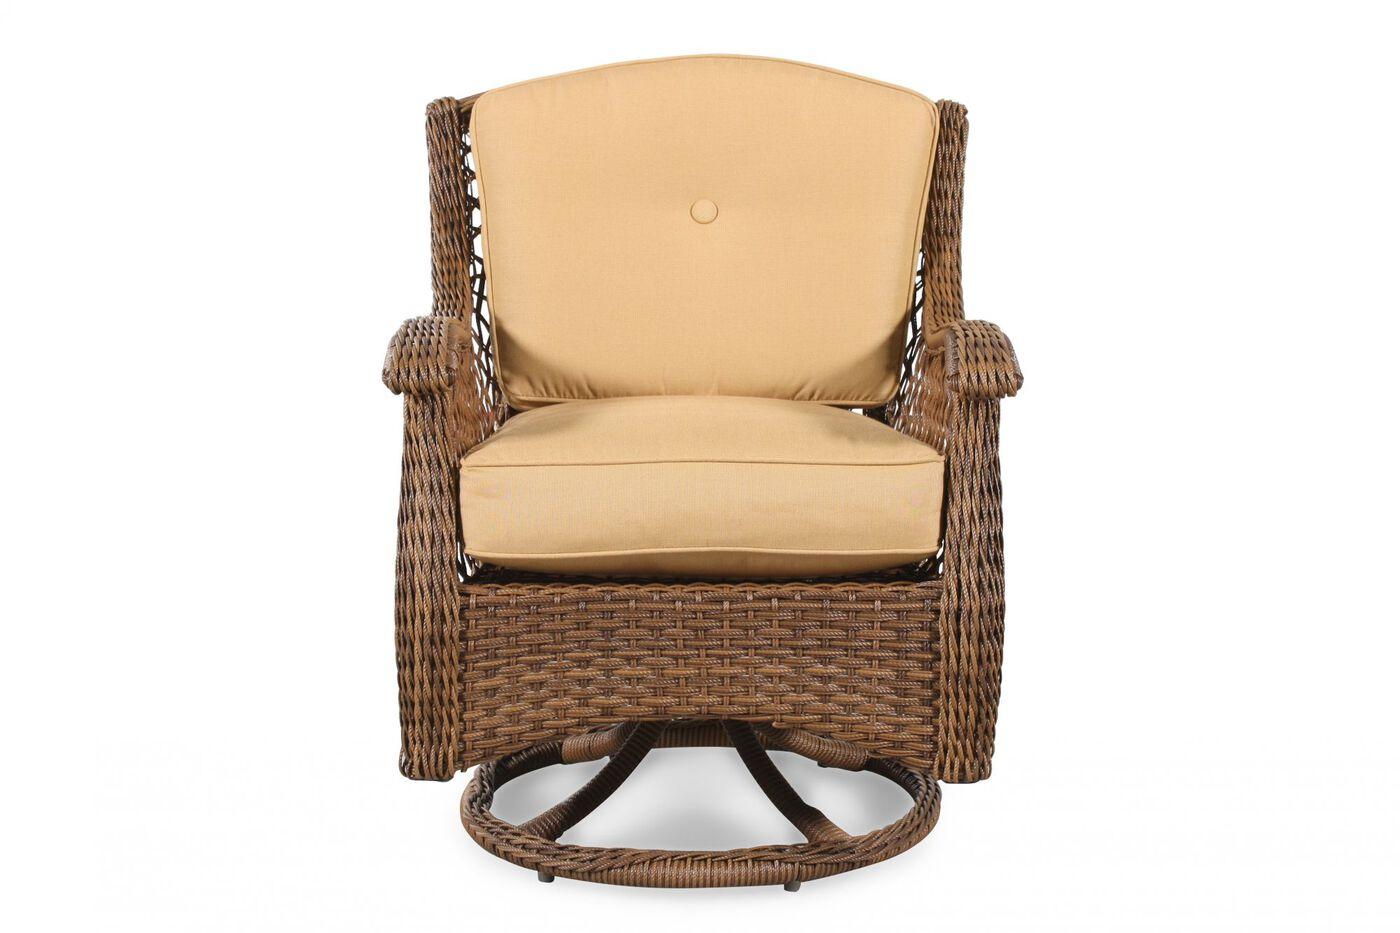 Agio Veranda Patio Swivel Rocker Chair Mathis Brothers